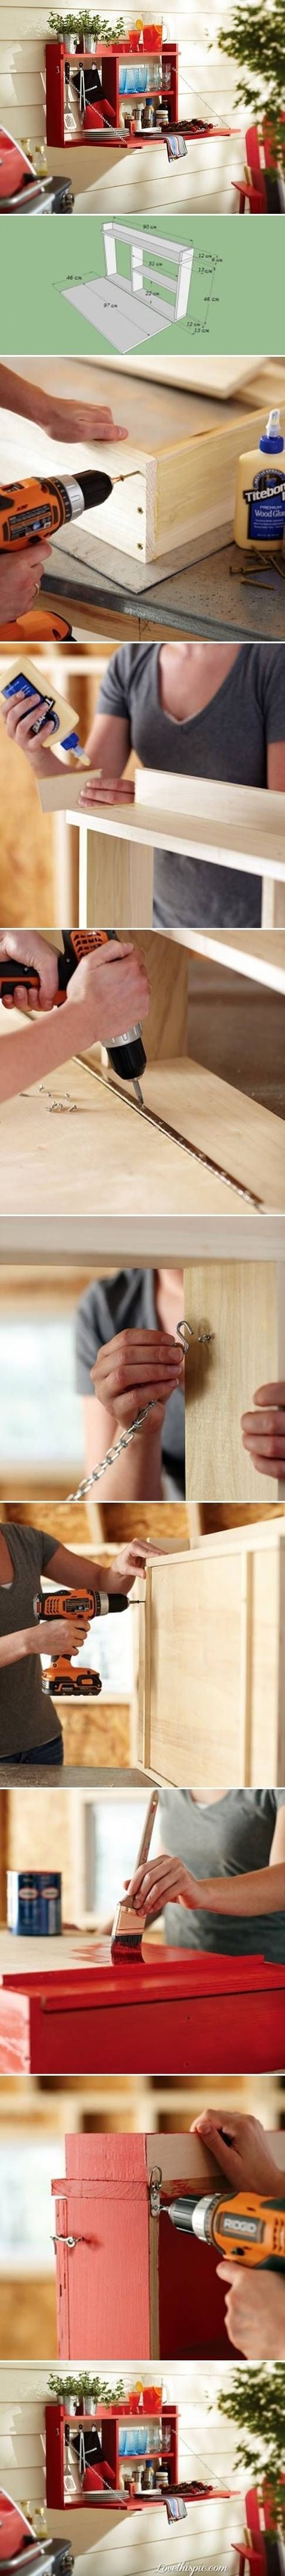 Pocket door hardware folding concepta 25 hawa 183 better building - Fold Down Table Tutorial